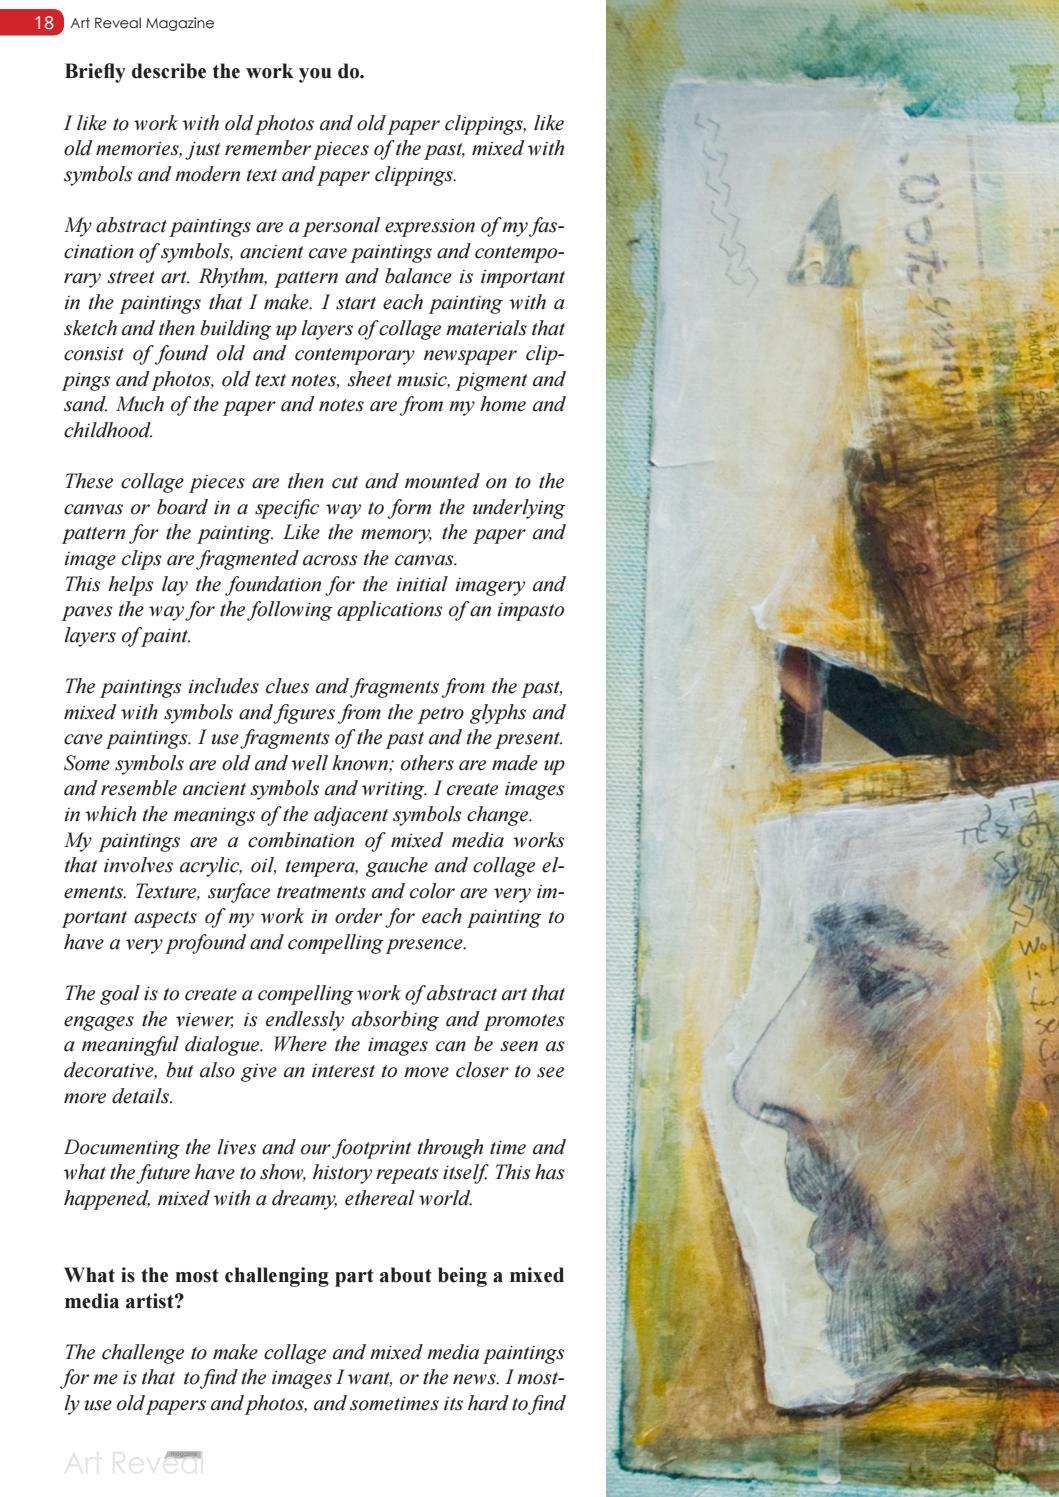 art reveal magazine no 17 by art reveal magazine issuu